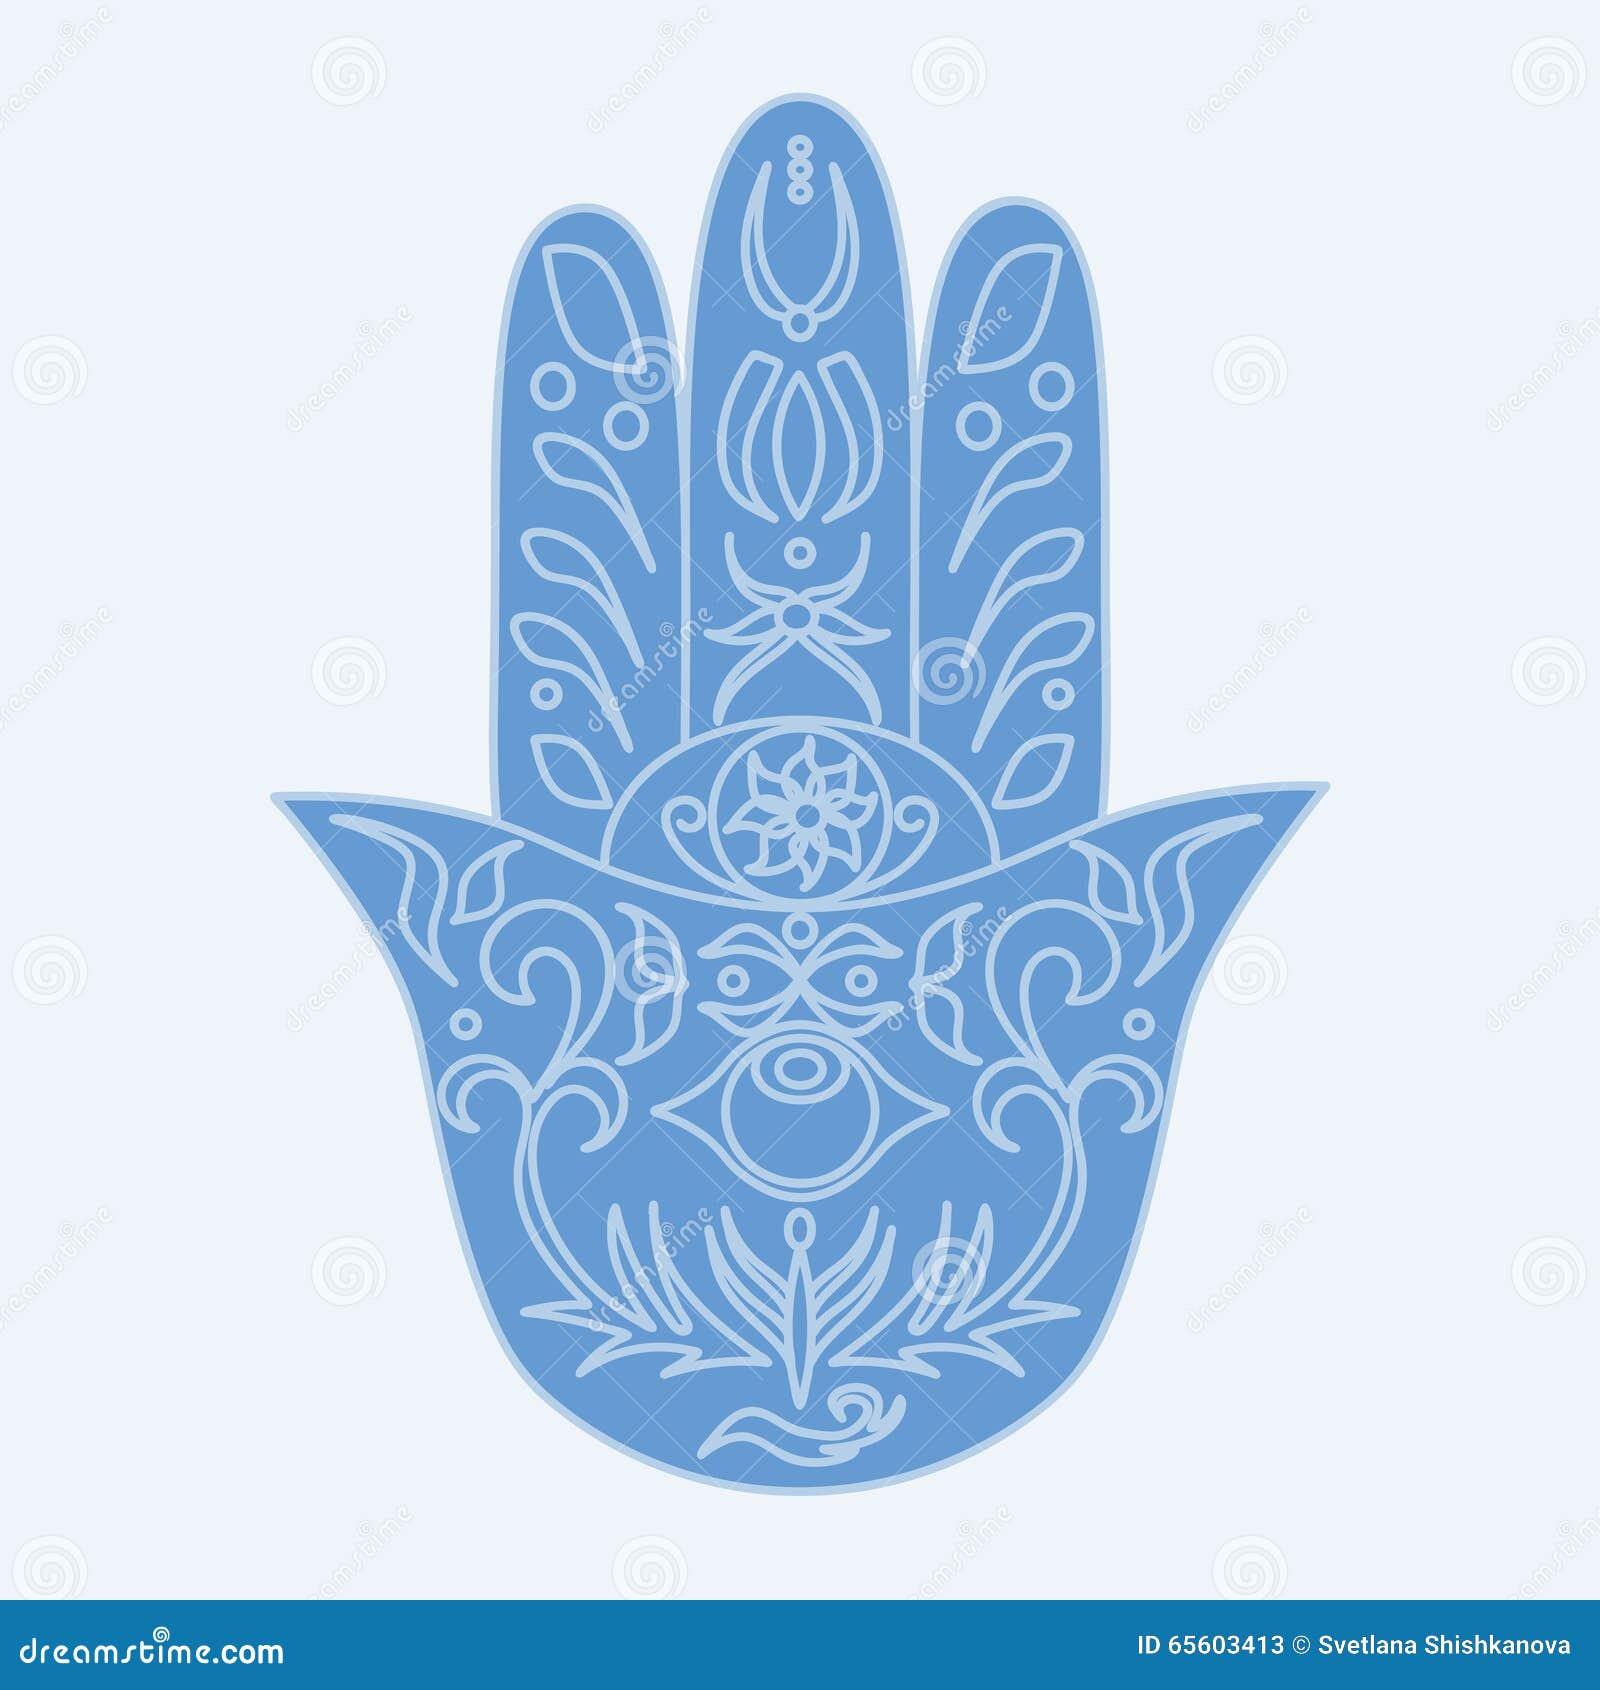 Elegant Ornate Hand Drawn Hamsa Hand Of Fatima Stock Vector